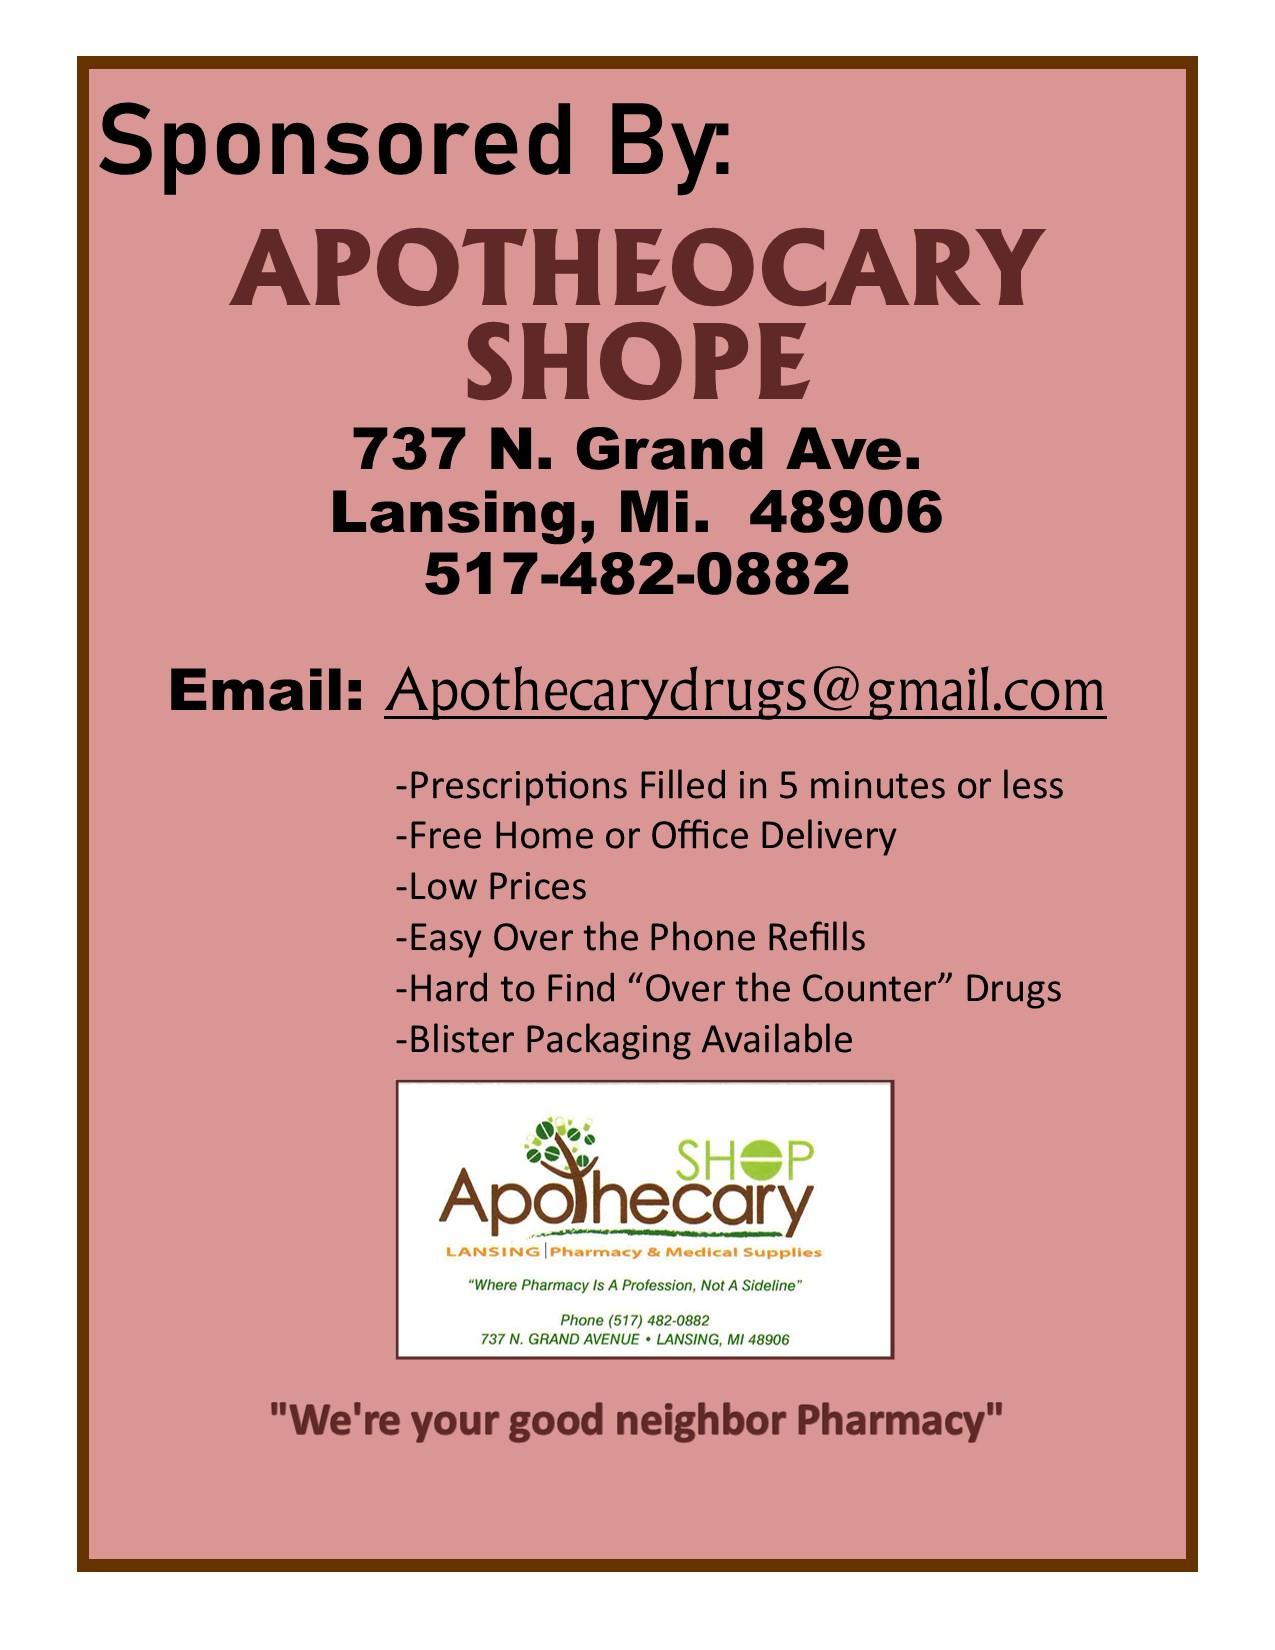 apothocary Shoppe